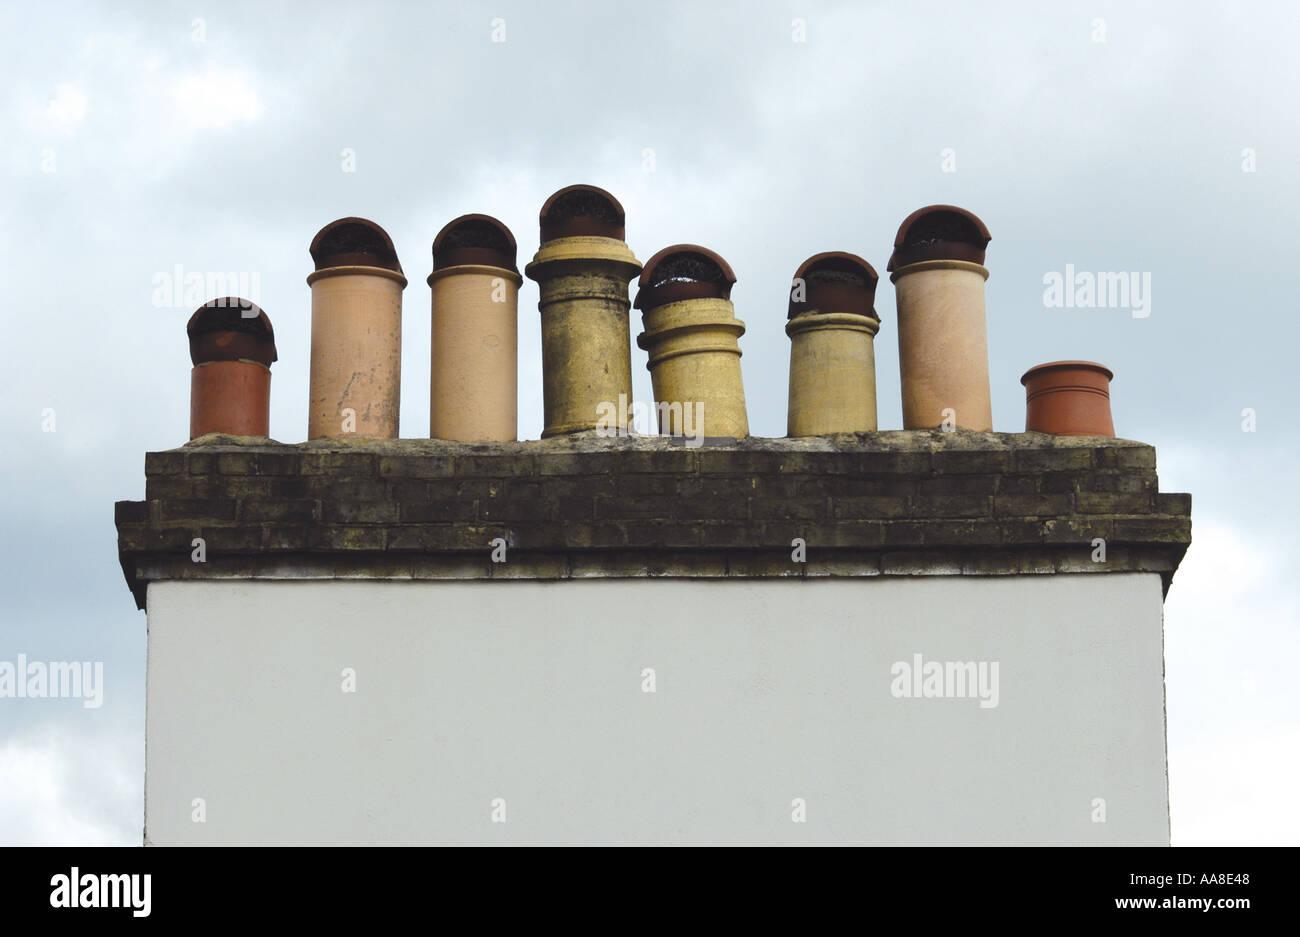 Chimneys - Stock Image